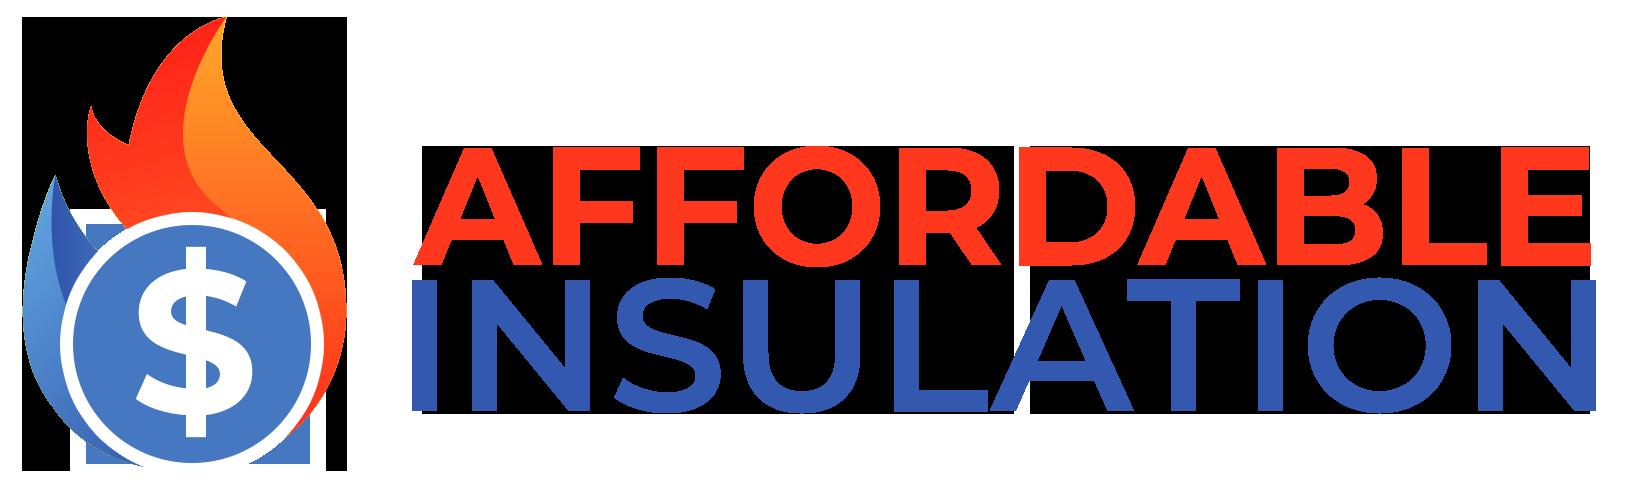 Affordable Insulation  Logo